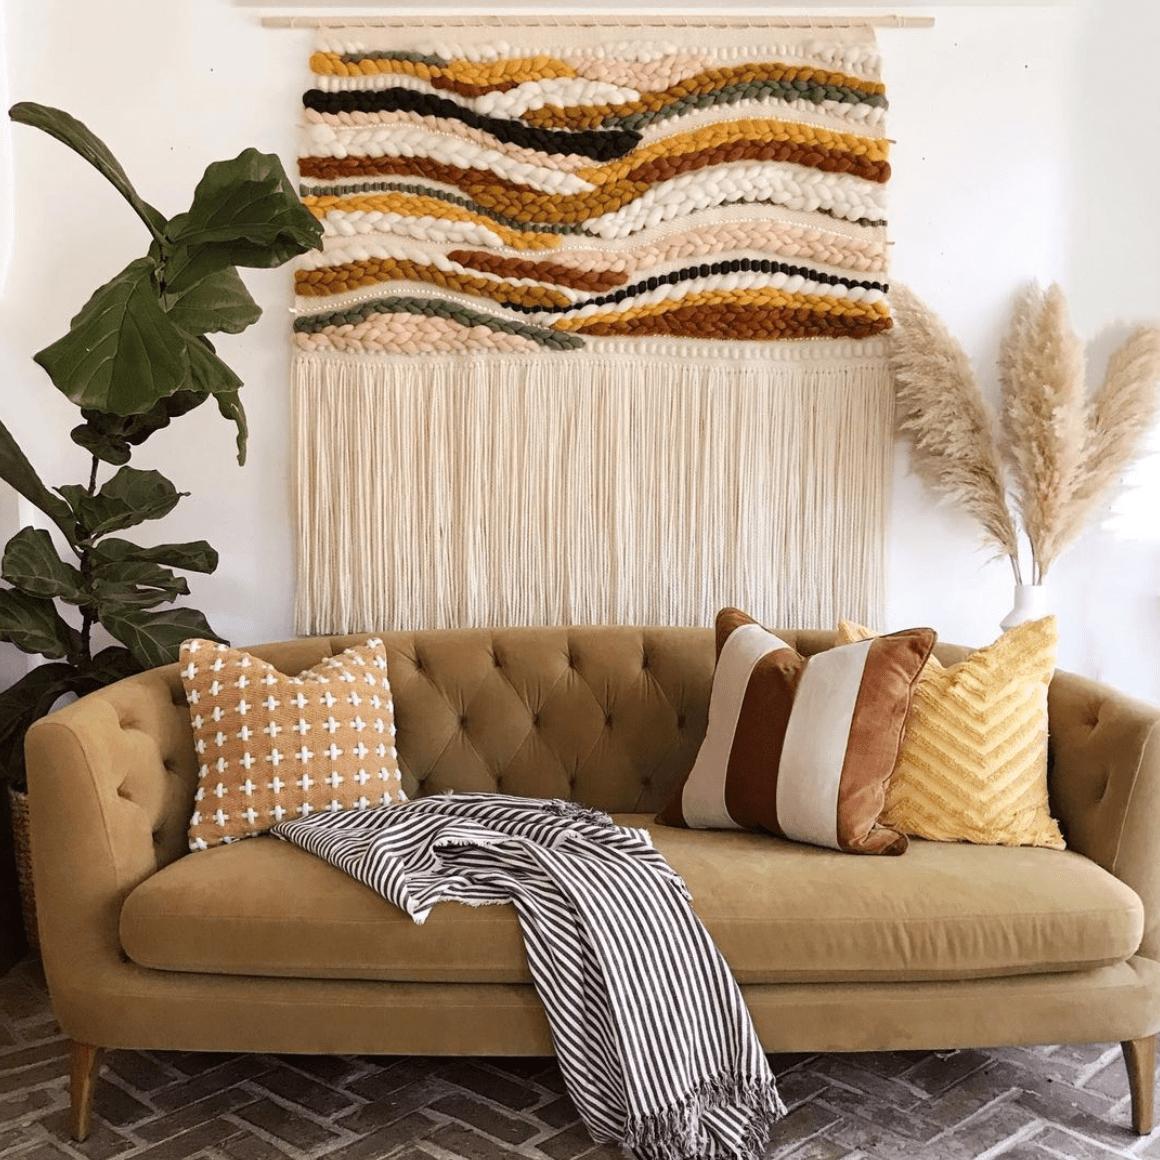 Wall Art Ideas That Fill Huge Walls, Large Living Room Wall Murals